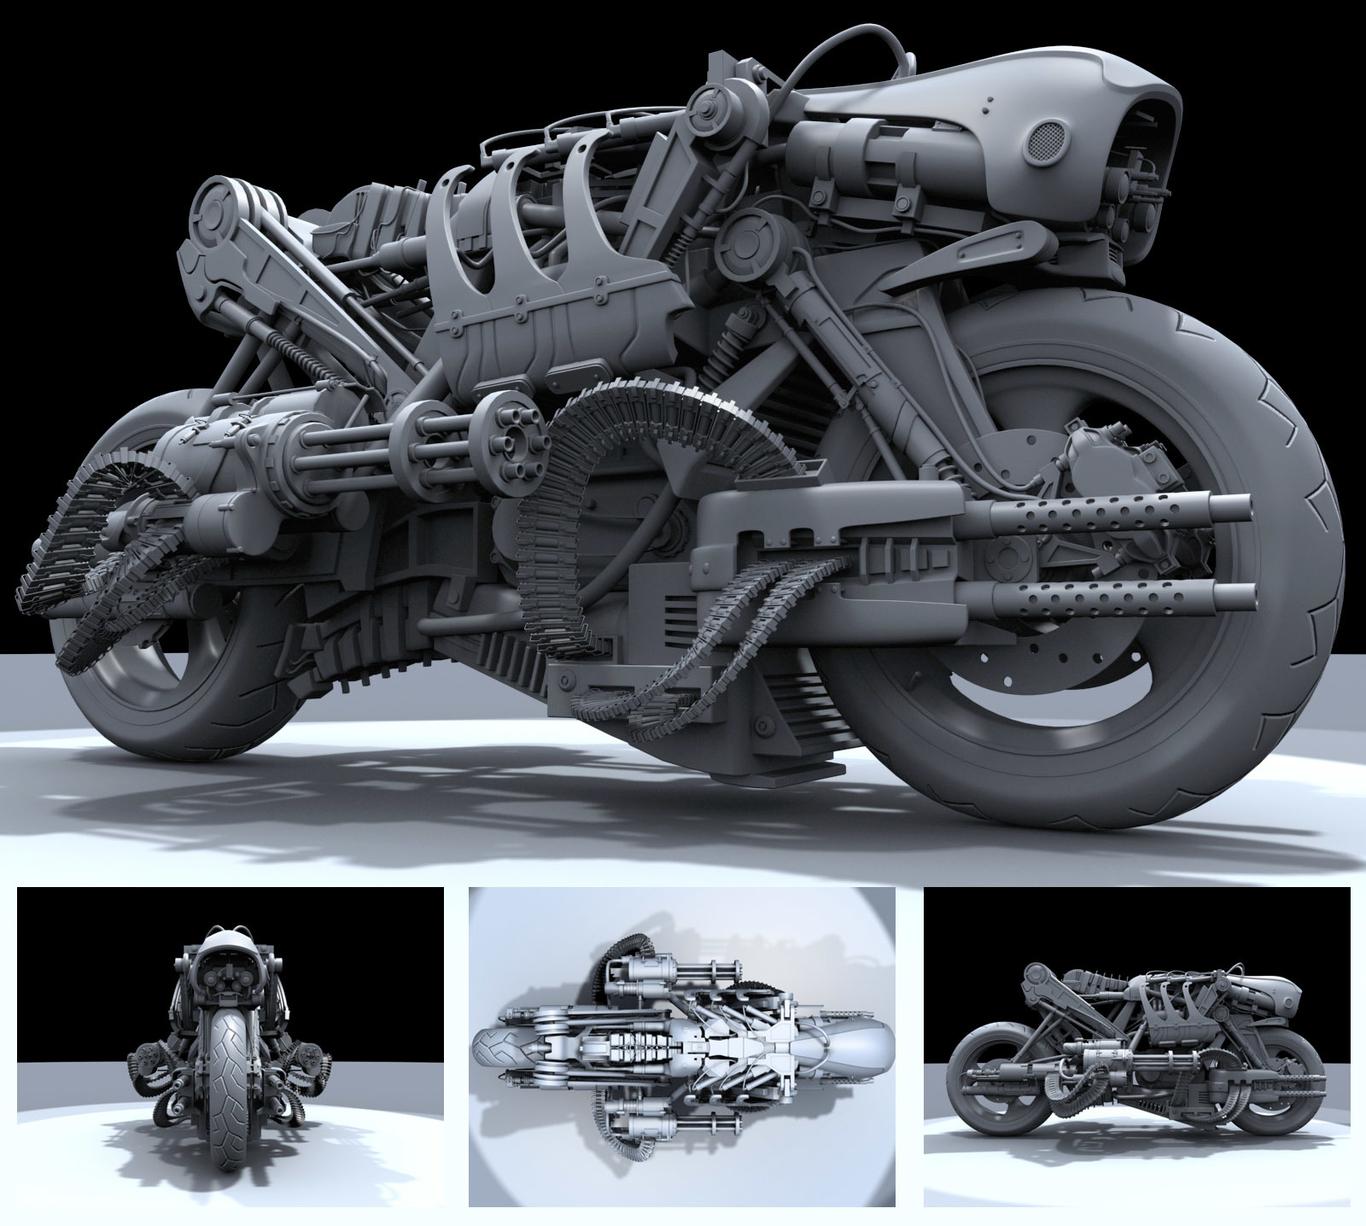 Bipolar mototerminator 1 d8a9328d 6y7a